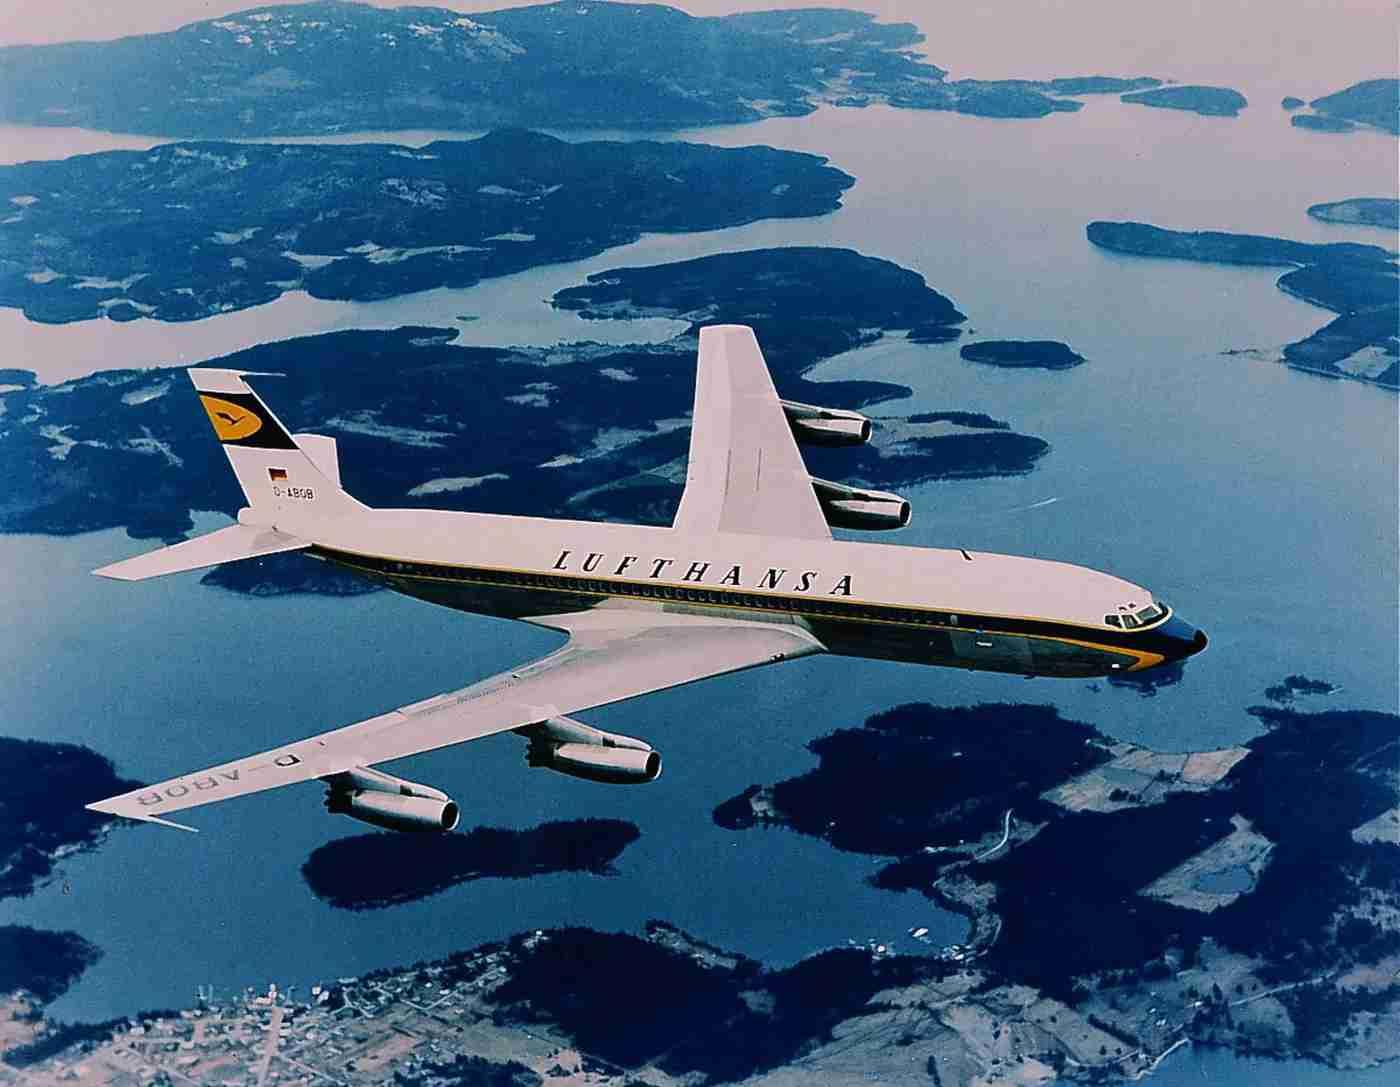 Photo by Lufthansa AG/ullstein bild via Getty Images